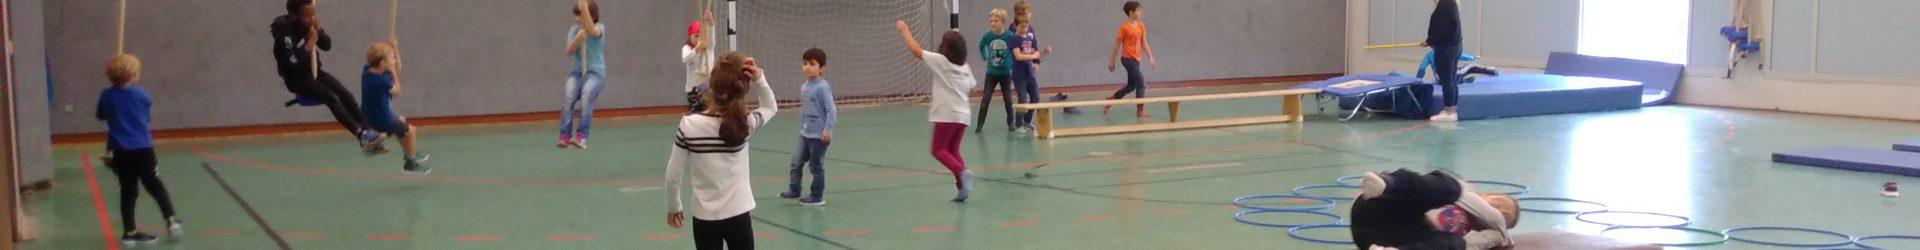 TuS Oberkassel bewegt OGS-Kids